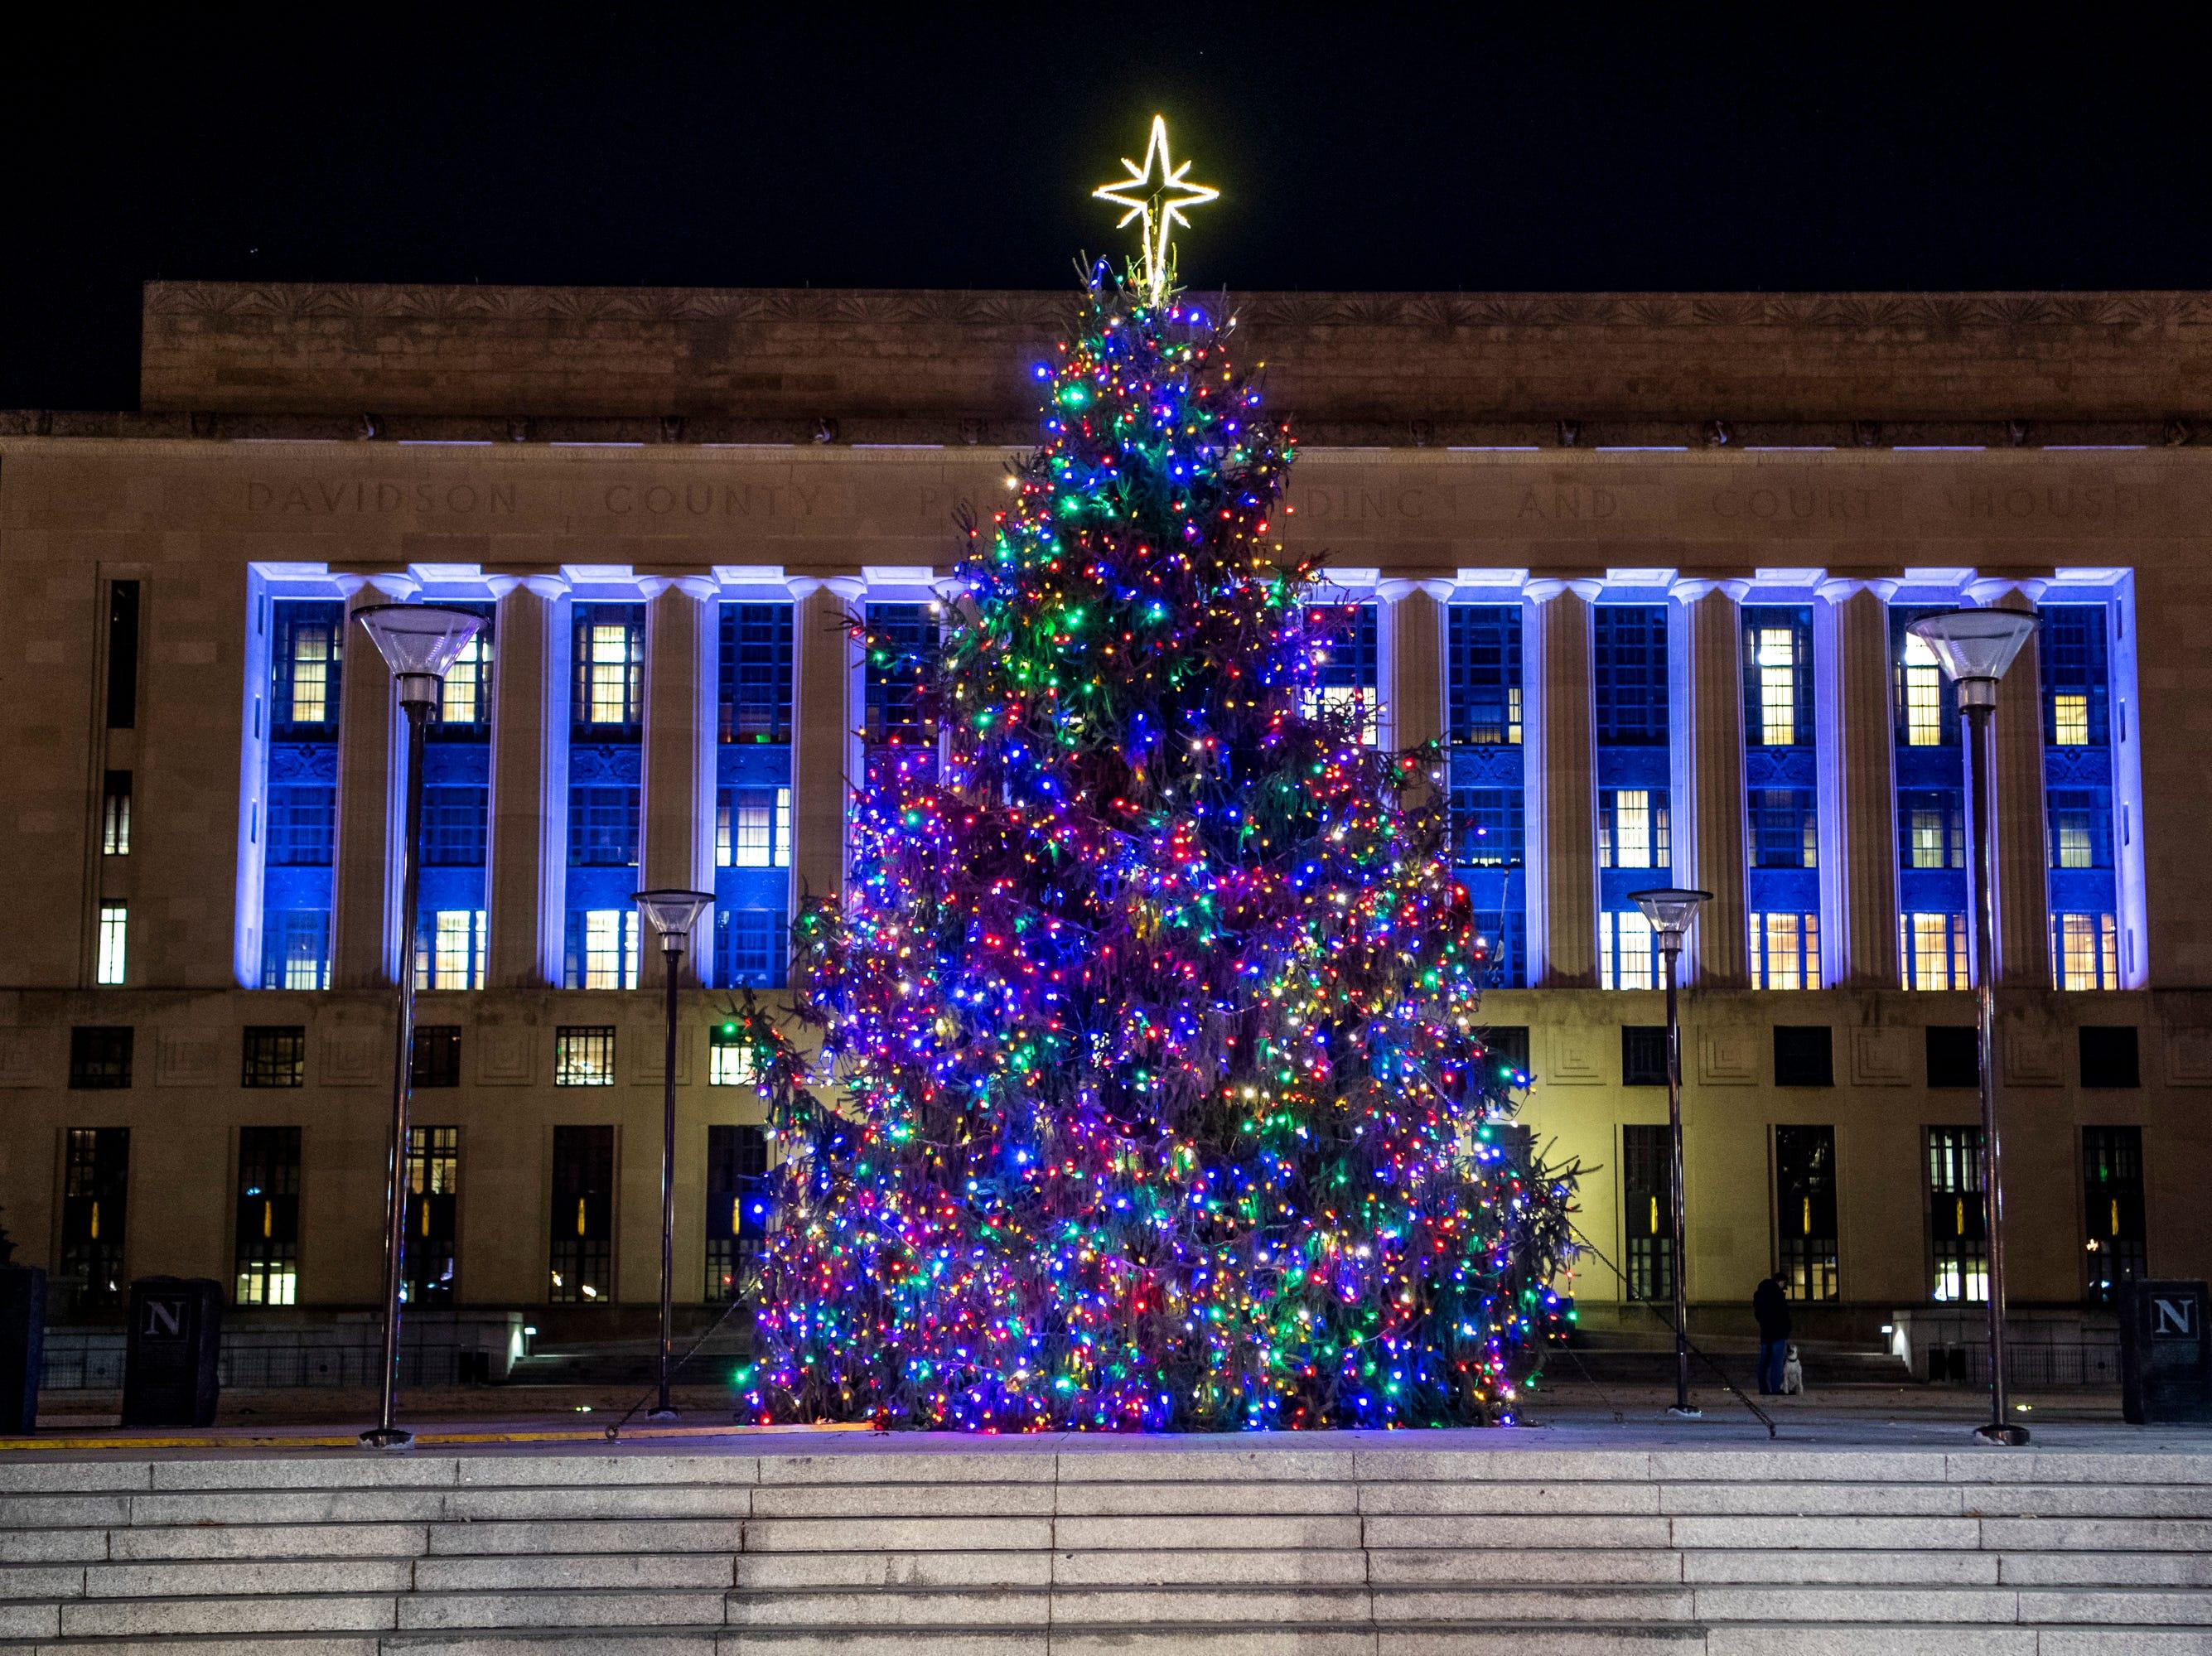 Christmas lights at Public Square Park in Nashville, Tenn., Monday, Dec. 10, 2018.